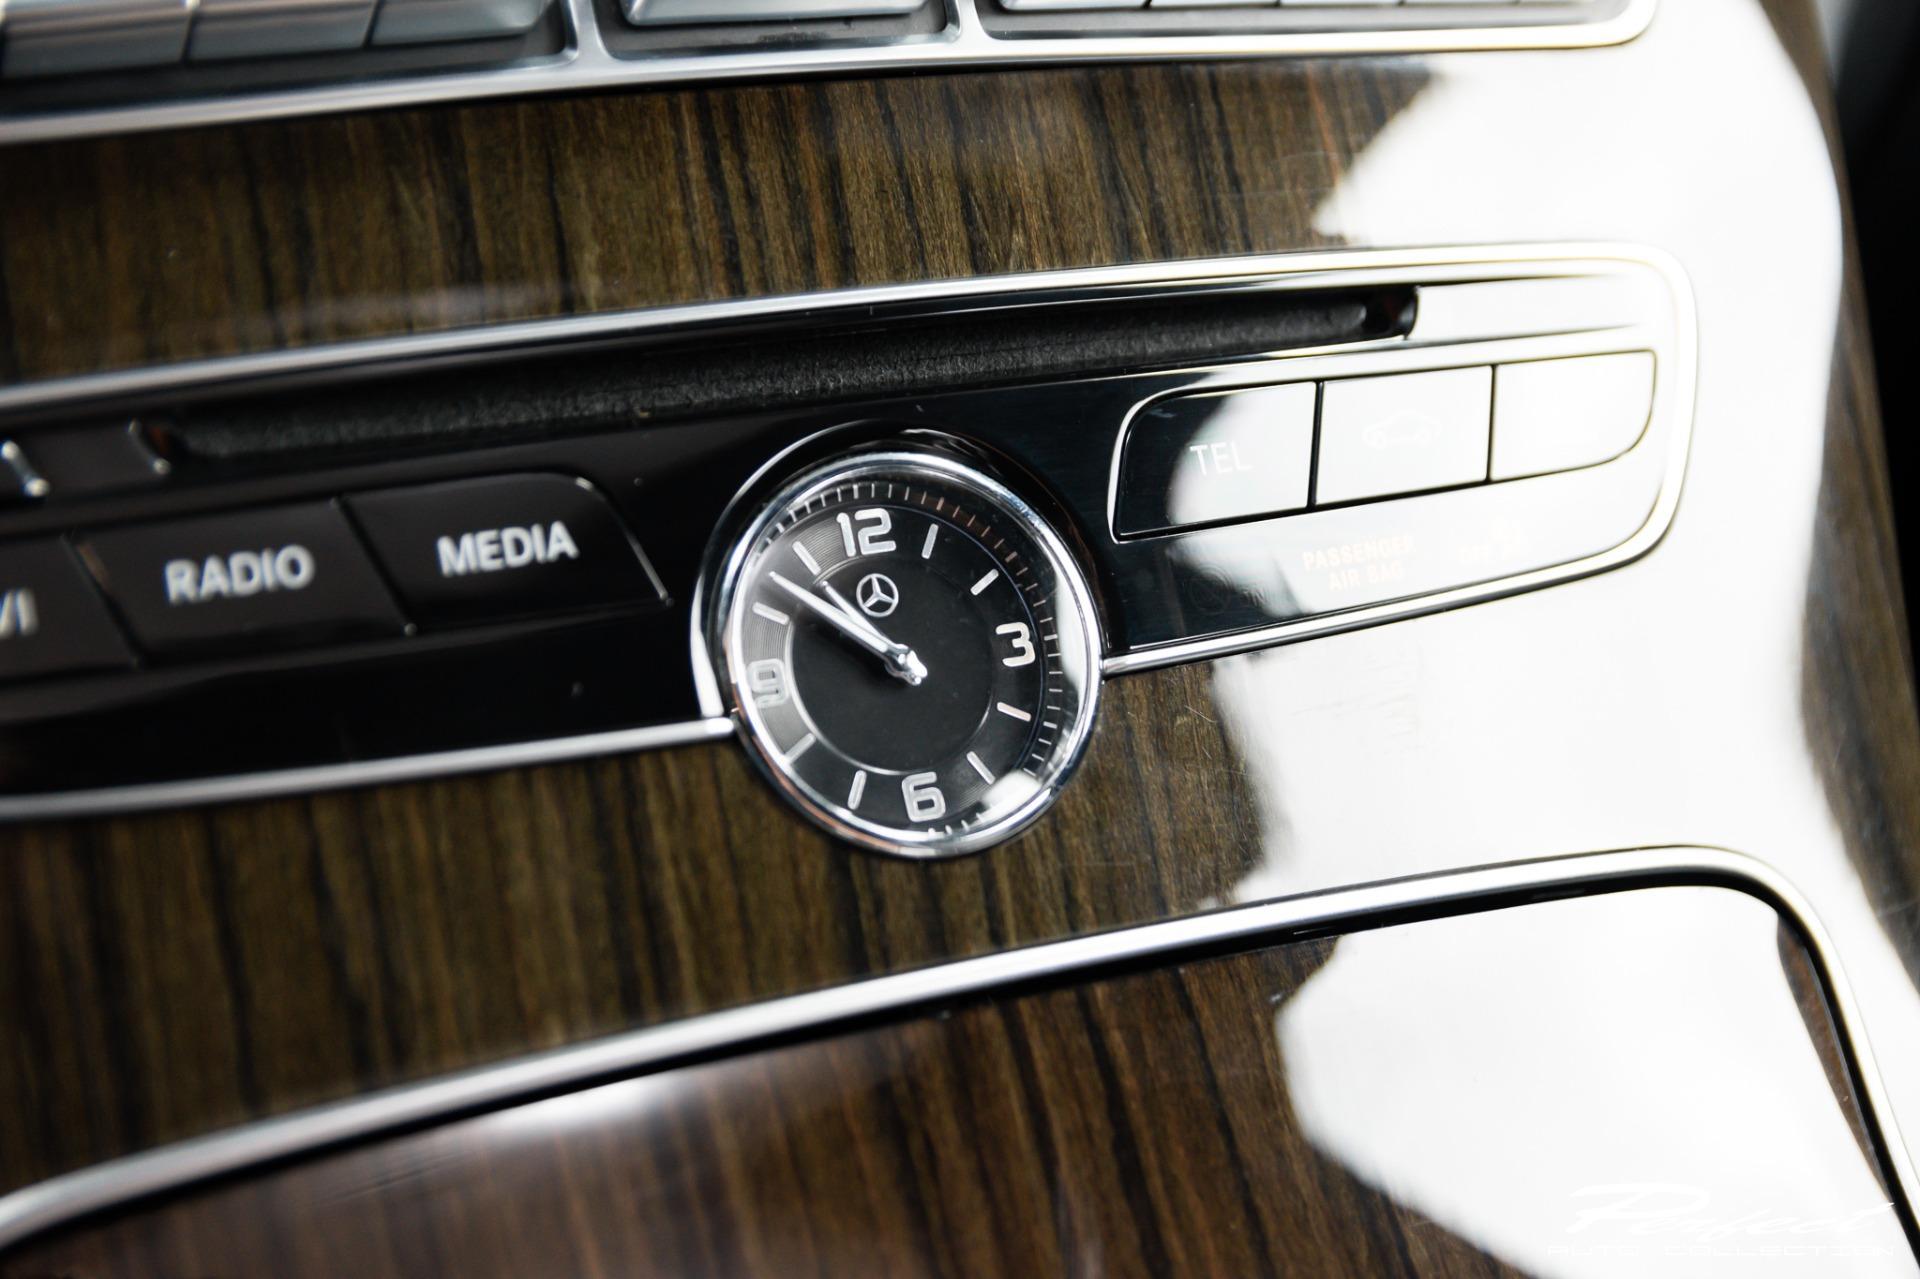 Used 2015 Mercedes Benz C Class C 400 4MATIC